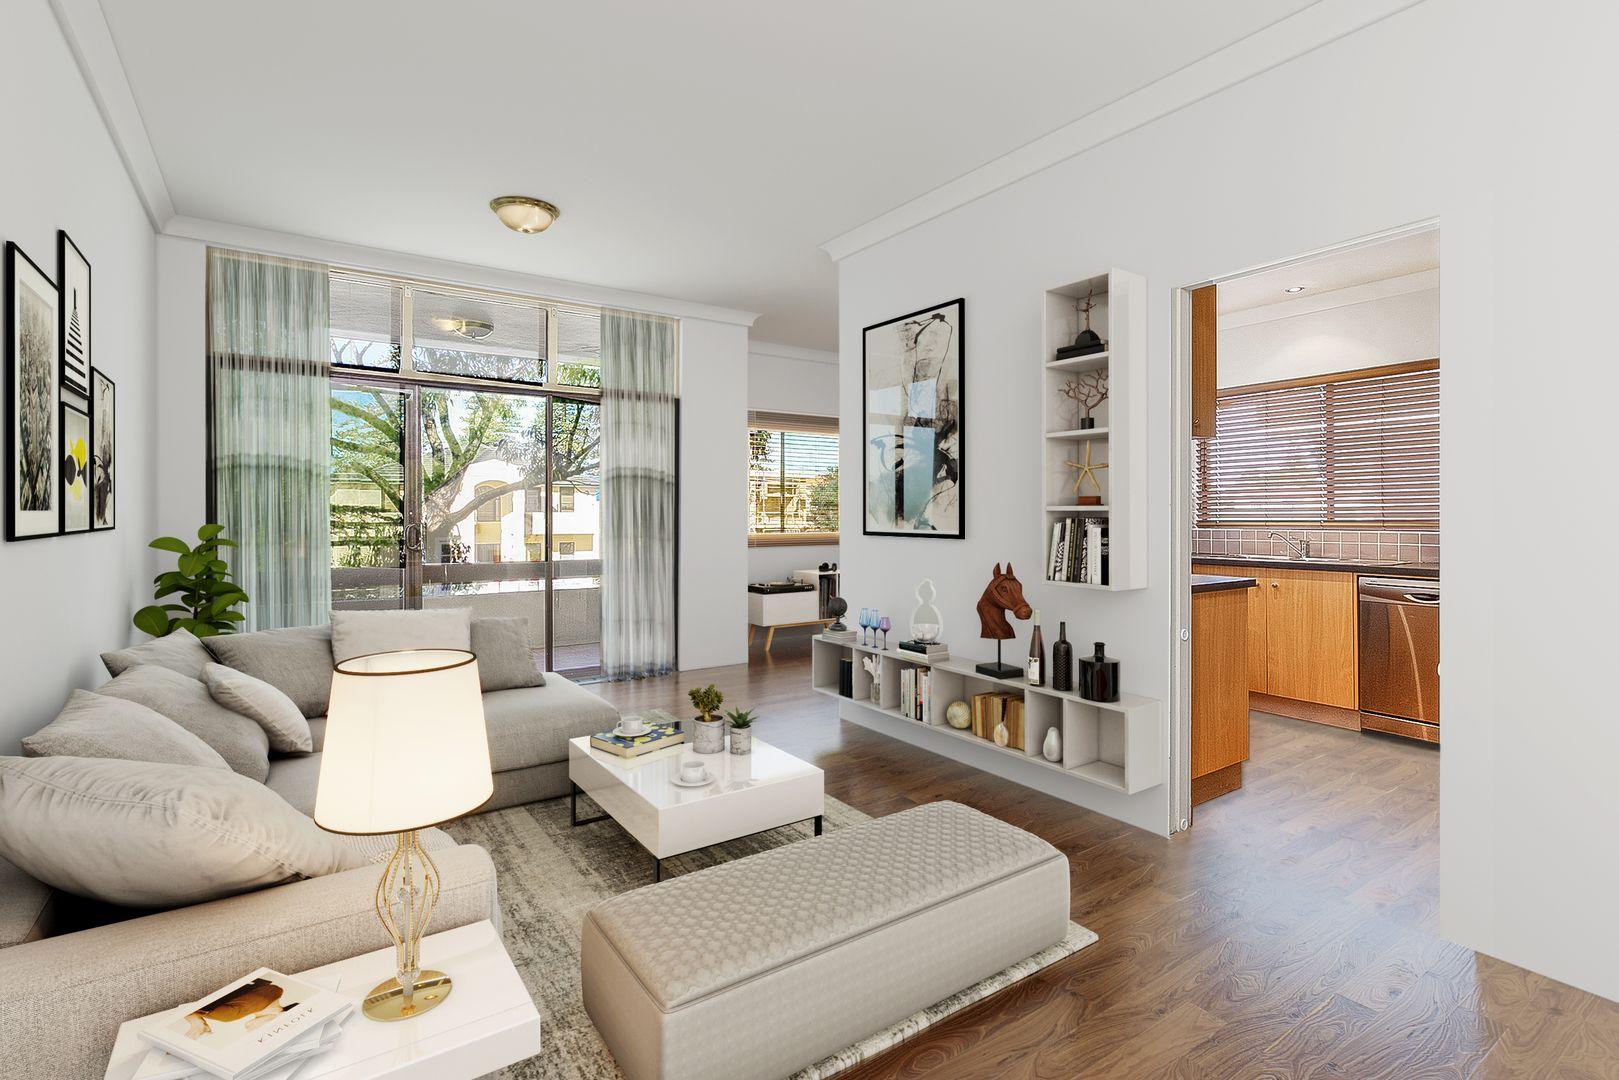 2/119 Clareville Avenue, Sandringham NSW 2219, Image 0